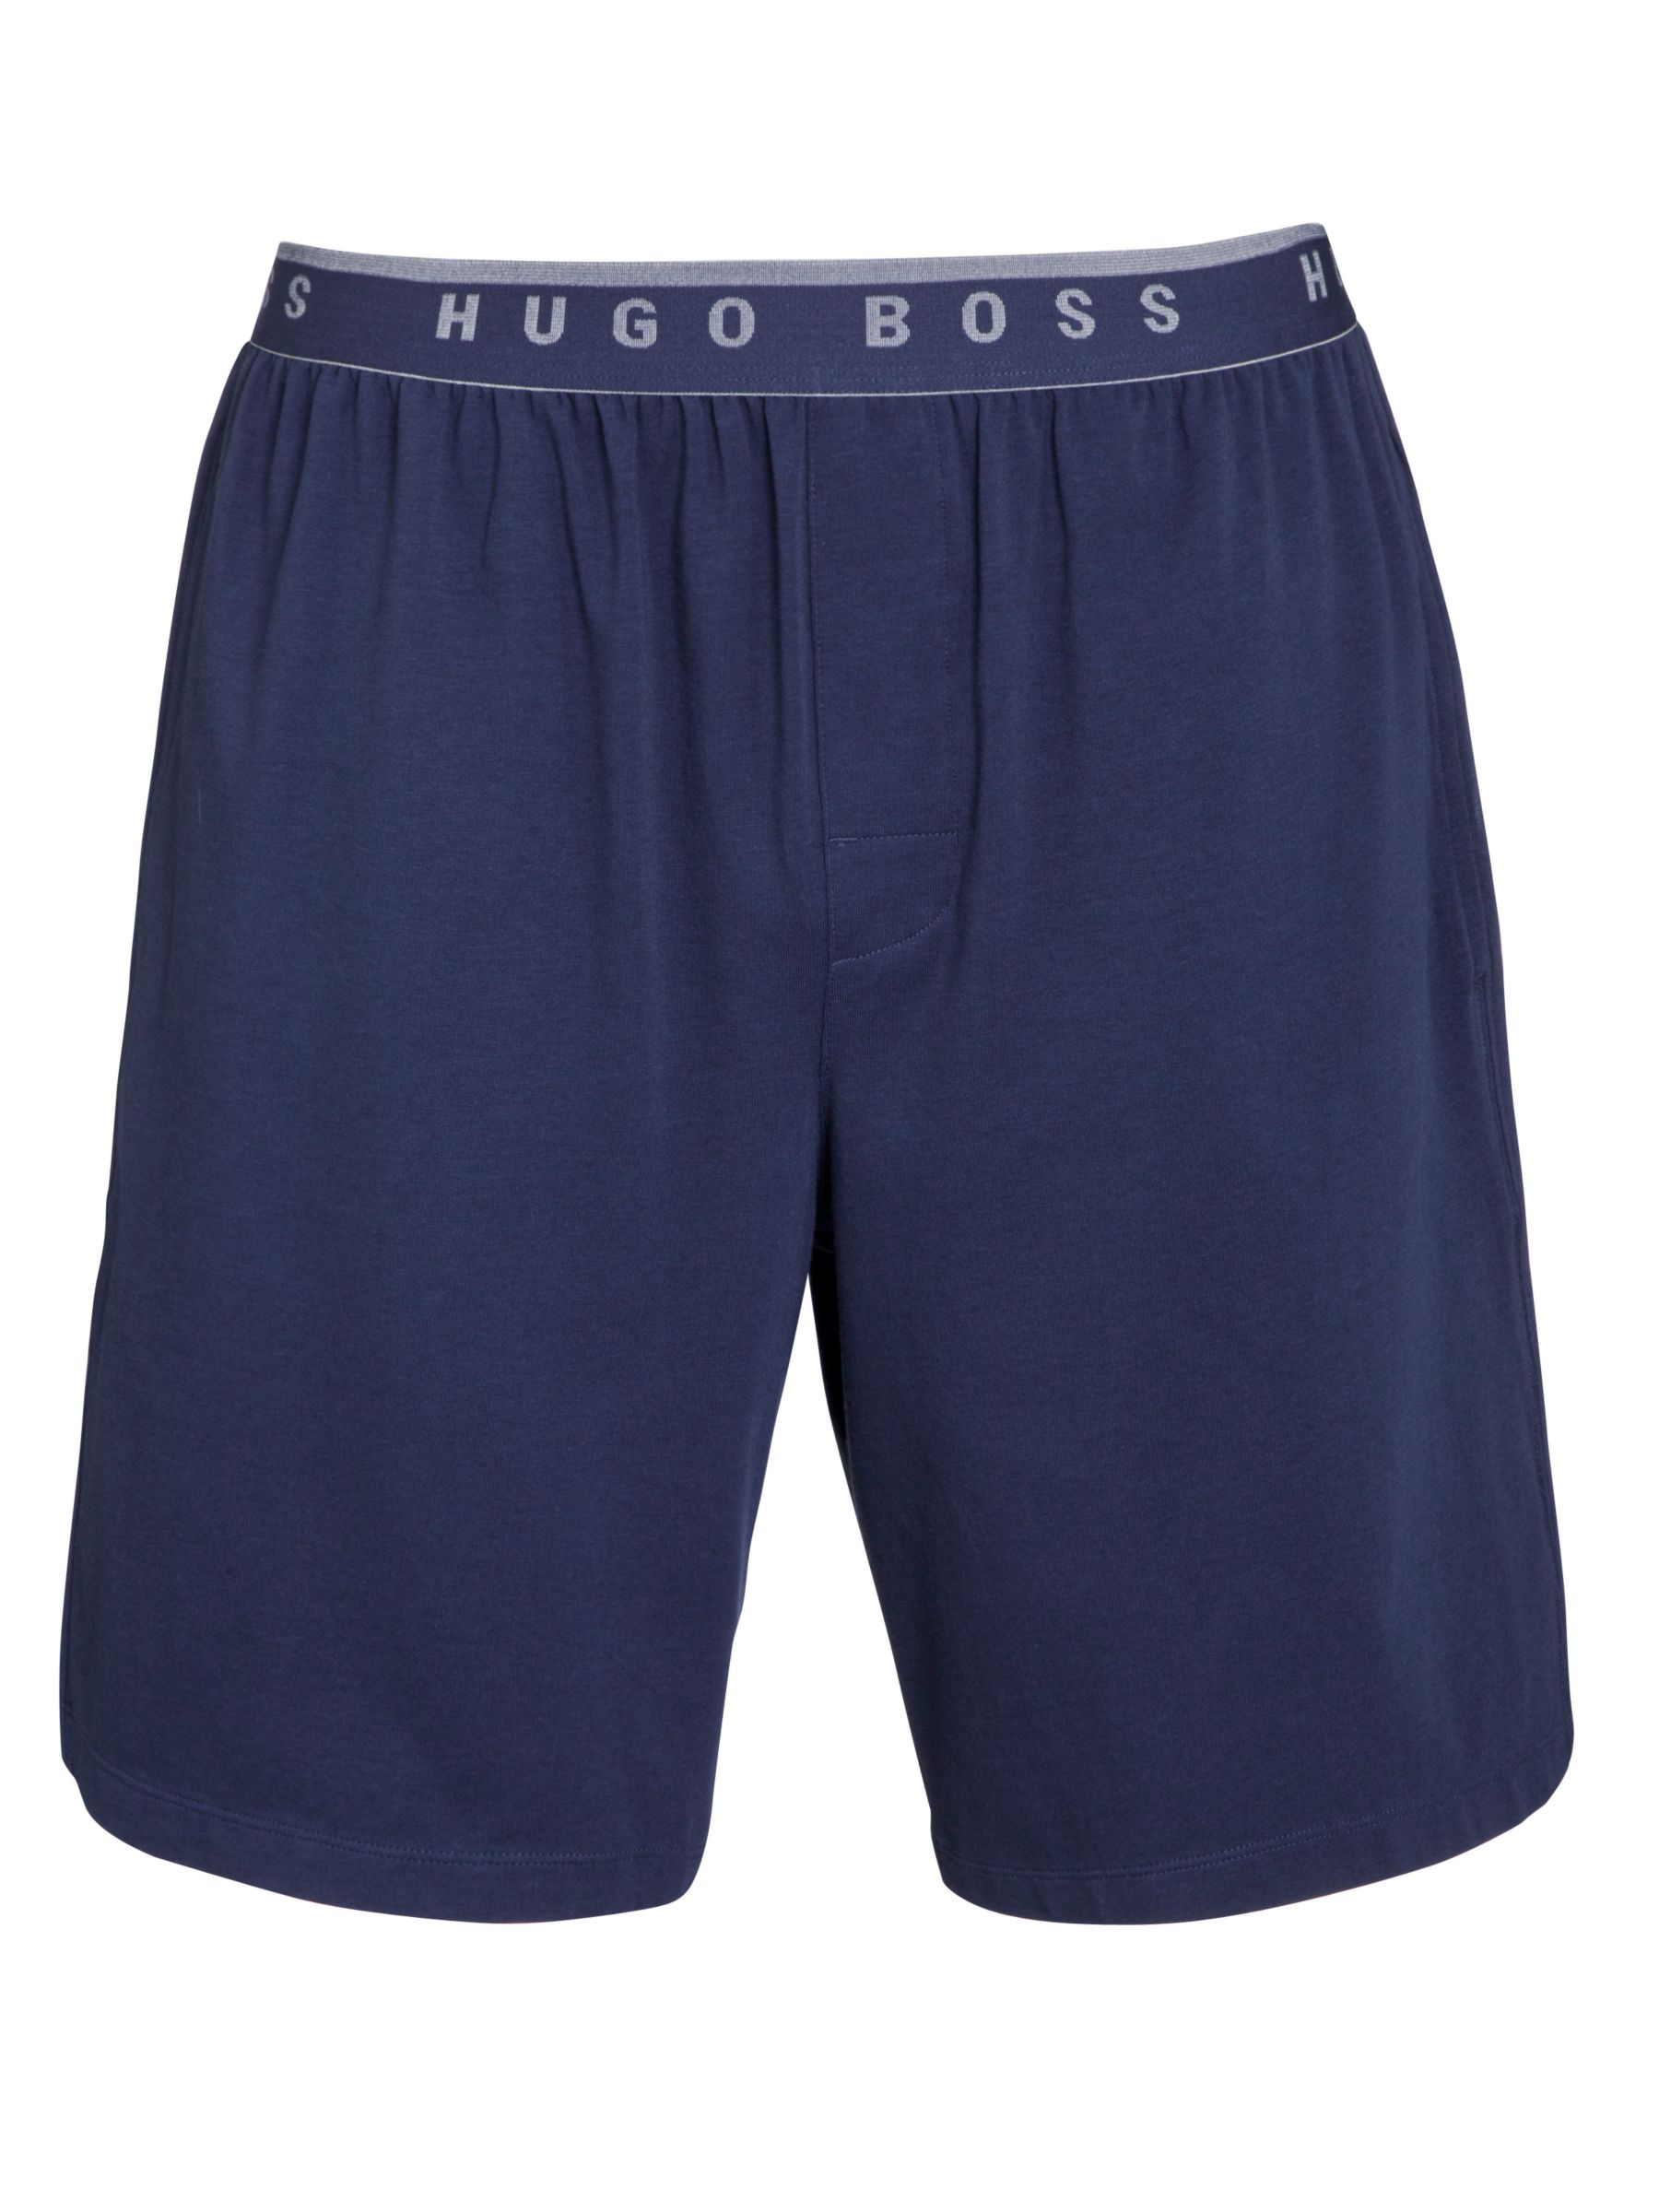 Hugo Boss Jersey Shorts, Navy